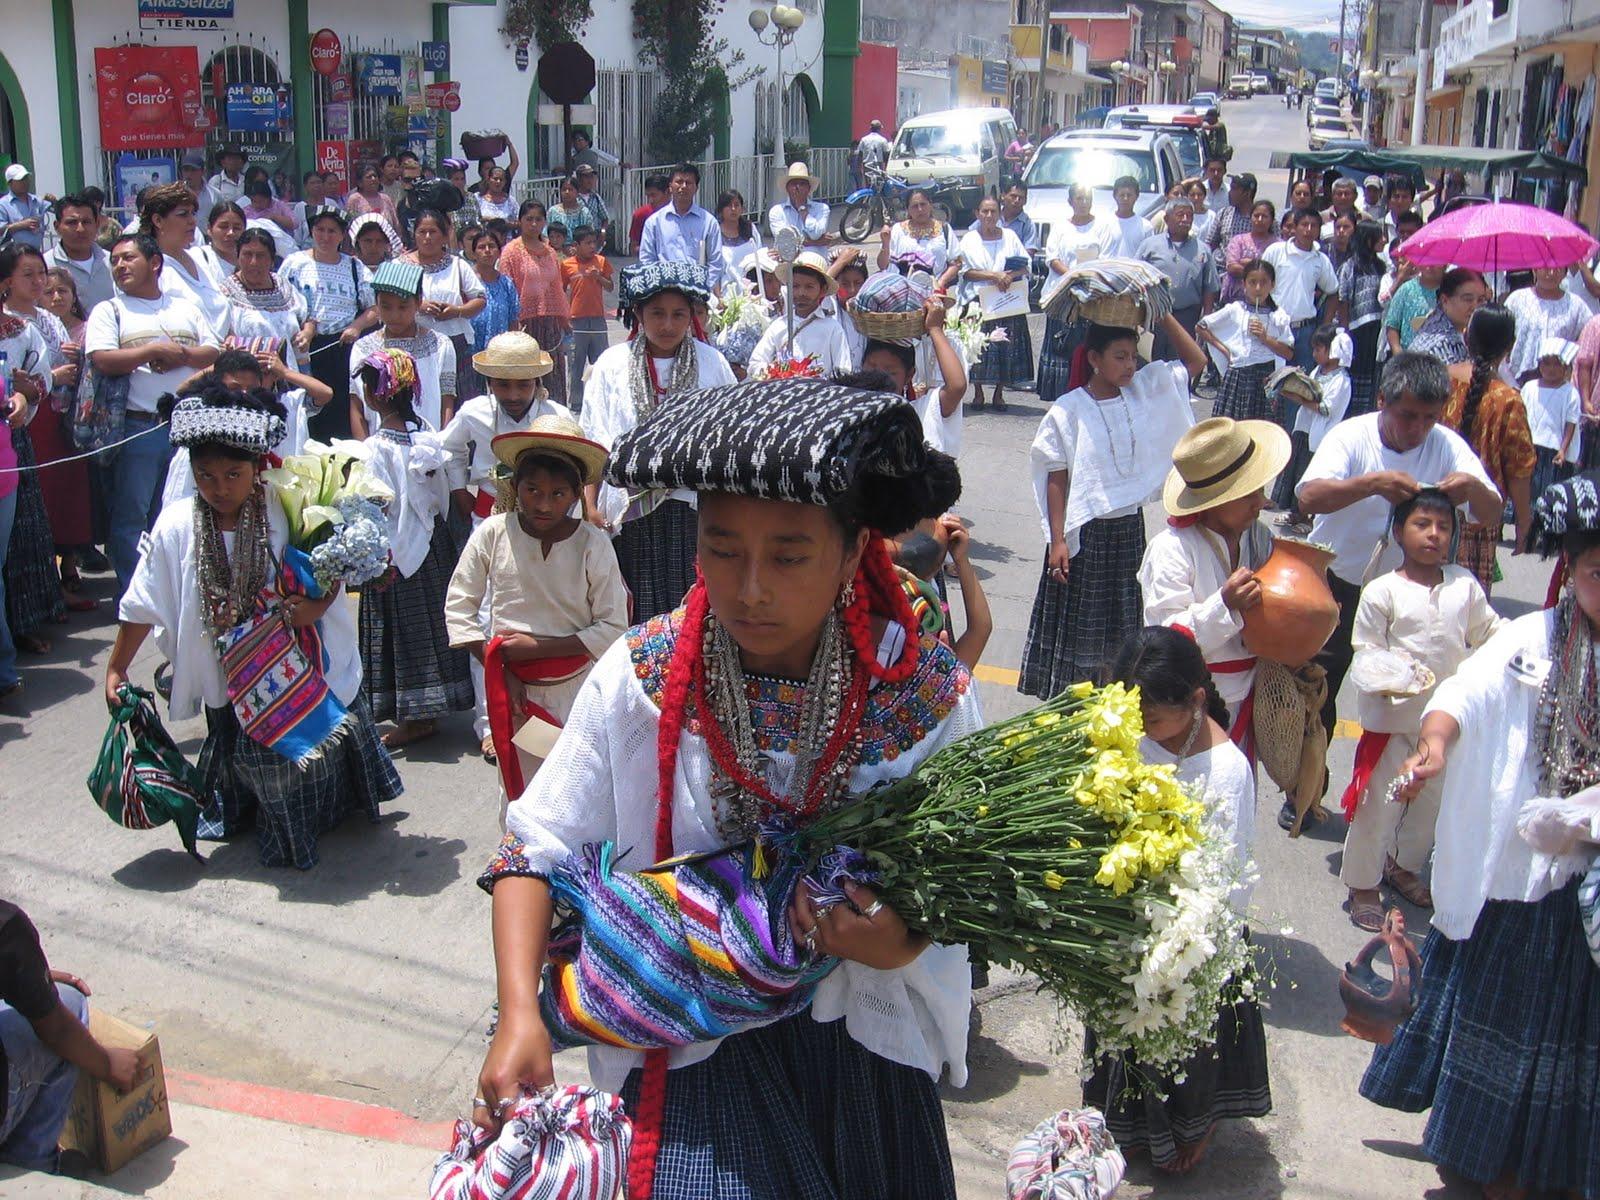 DESPEDIDA+RABIN+COBAN+2010+229 - Los Q'eqchi' en Guatemala